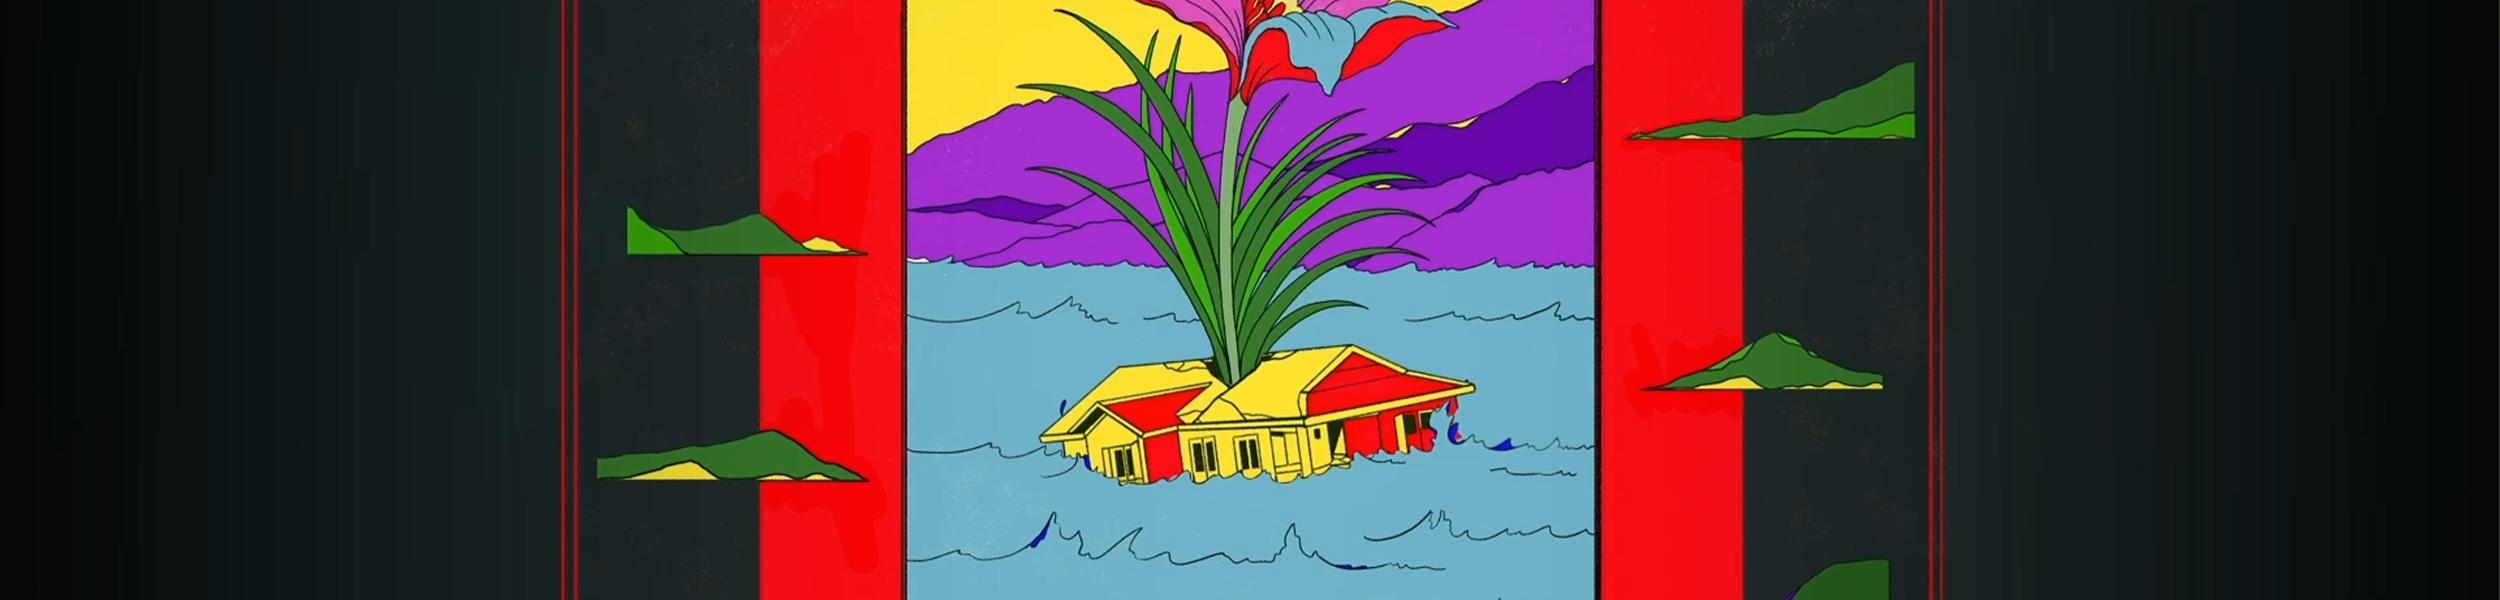 Future Islands - Future Islands Release 'For Sure (Dan Deacon Remix)'